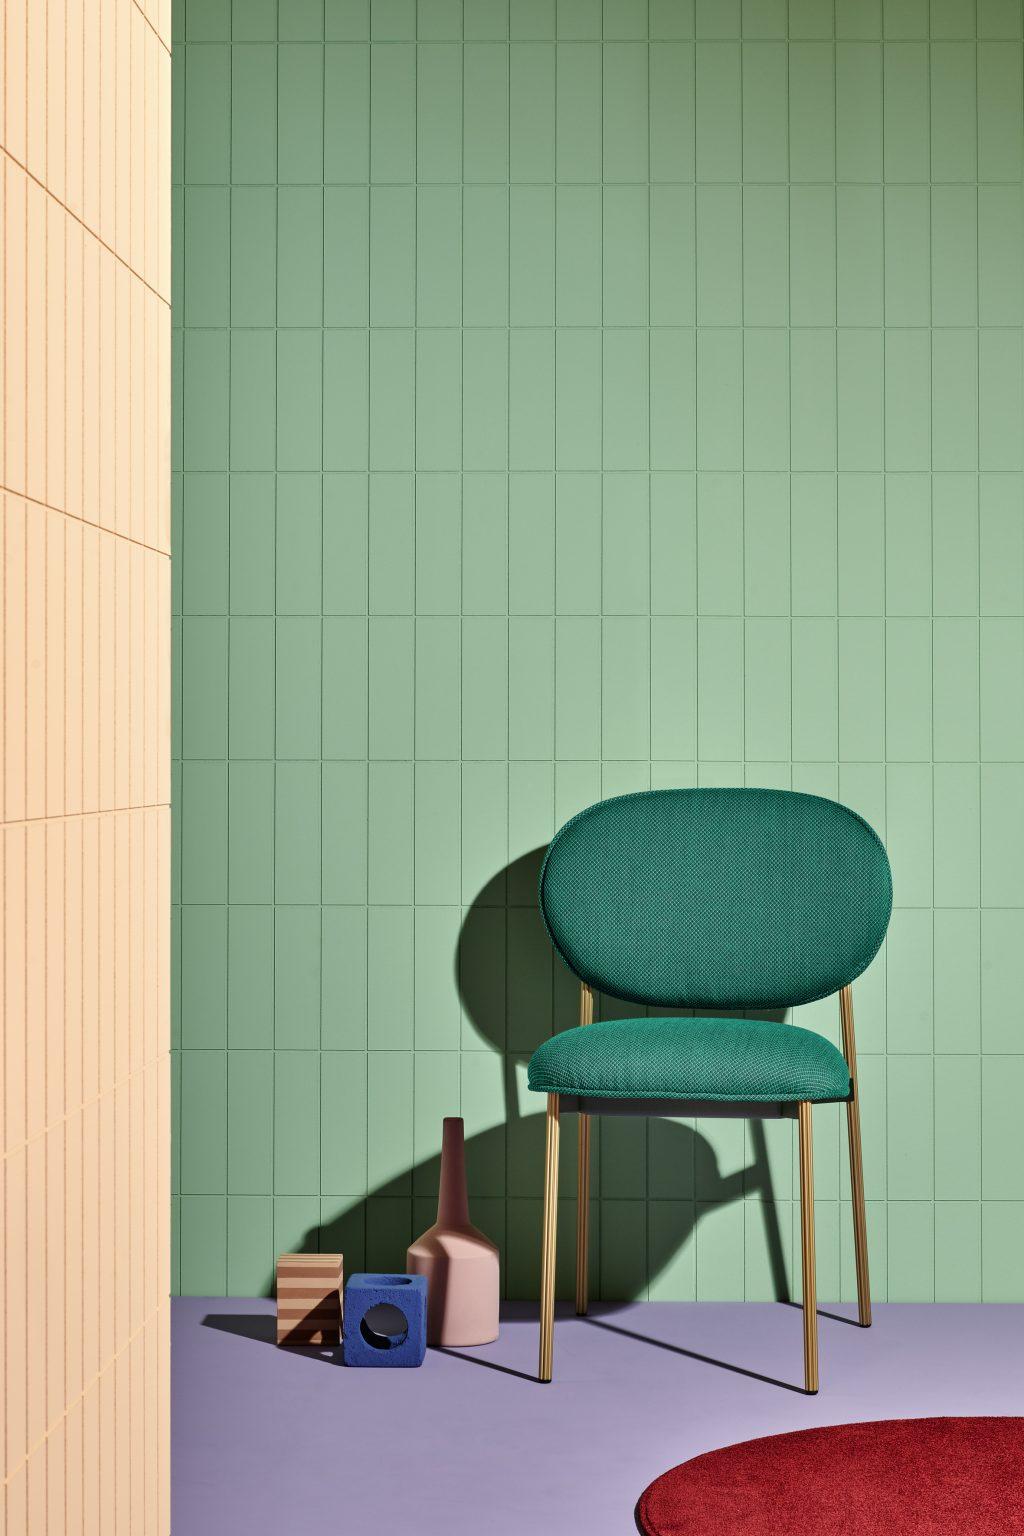 Biennale Interieur - Belgium's leading design and interior event - Pedrali_blume_sebastian-herkner_art-direction-studio-fm_photo-andrea-garuti-3.jpg